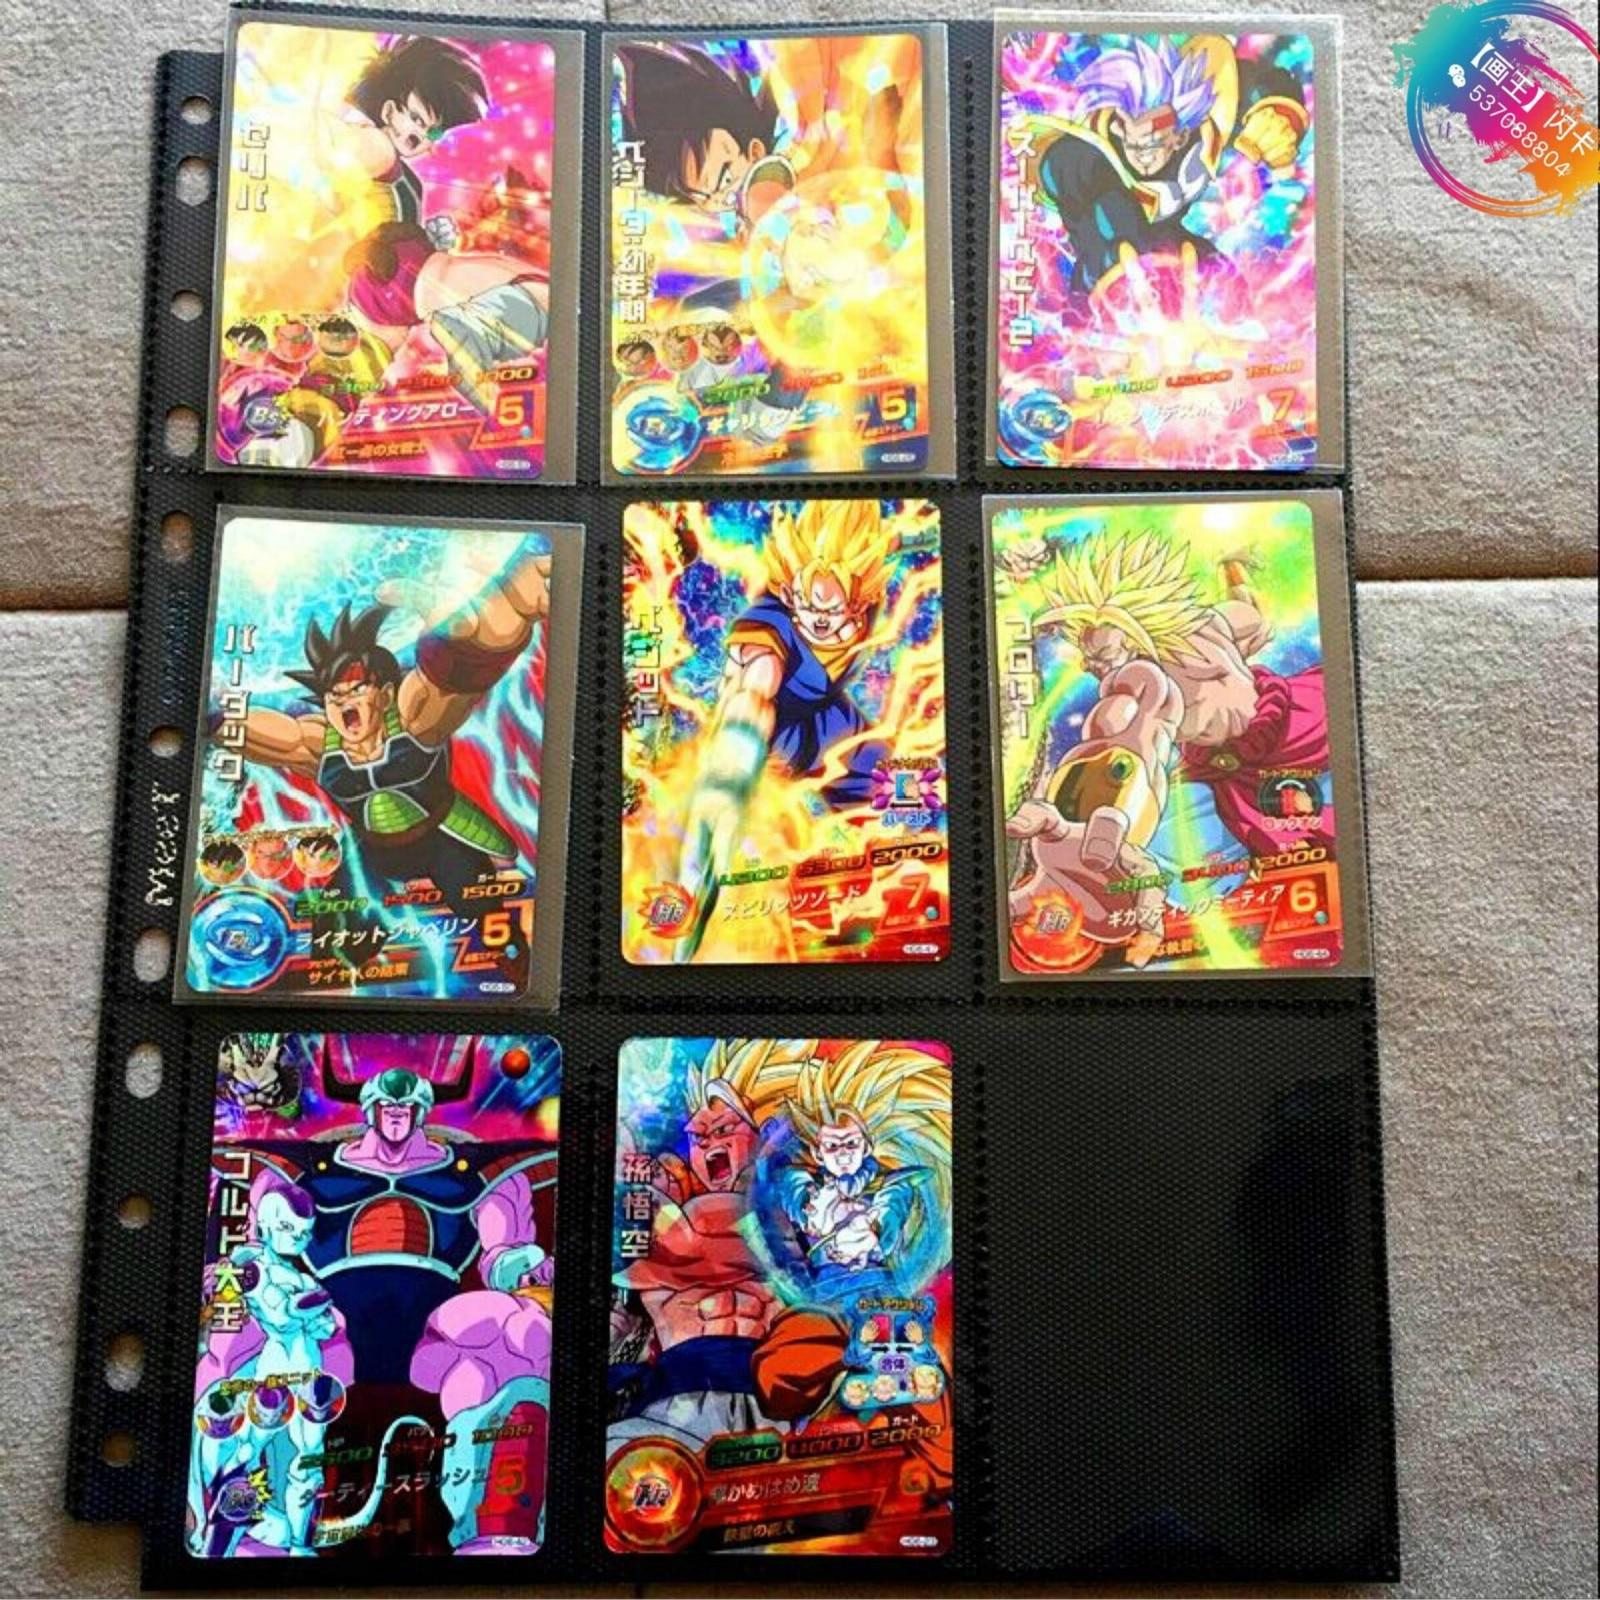 Japan Original Dragon Ball Hero Card SR Flash 3 Stars HG6 Goku Toys Hobbies Collectibles Game Collection Anime Cards